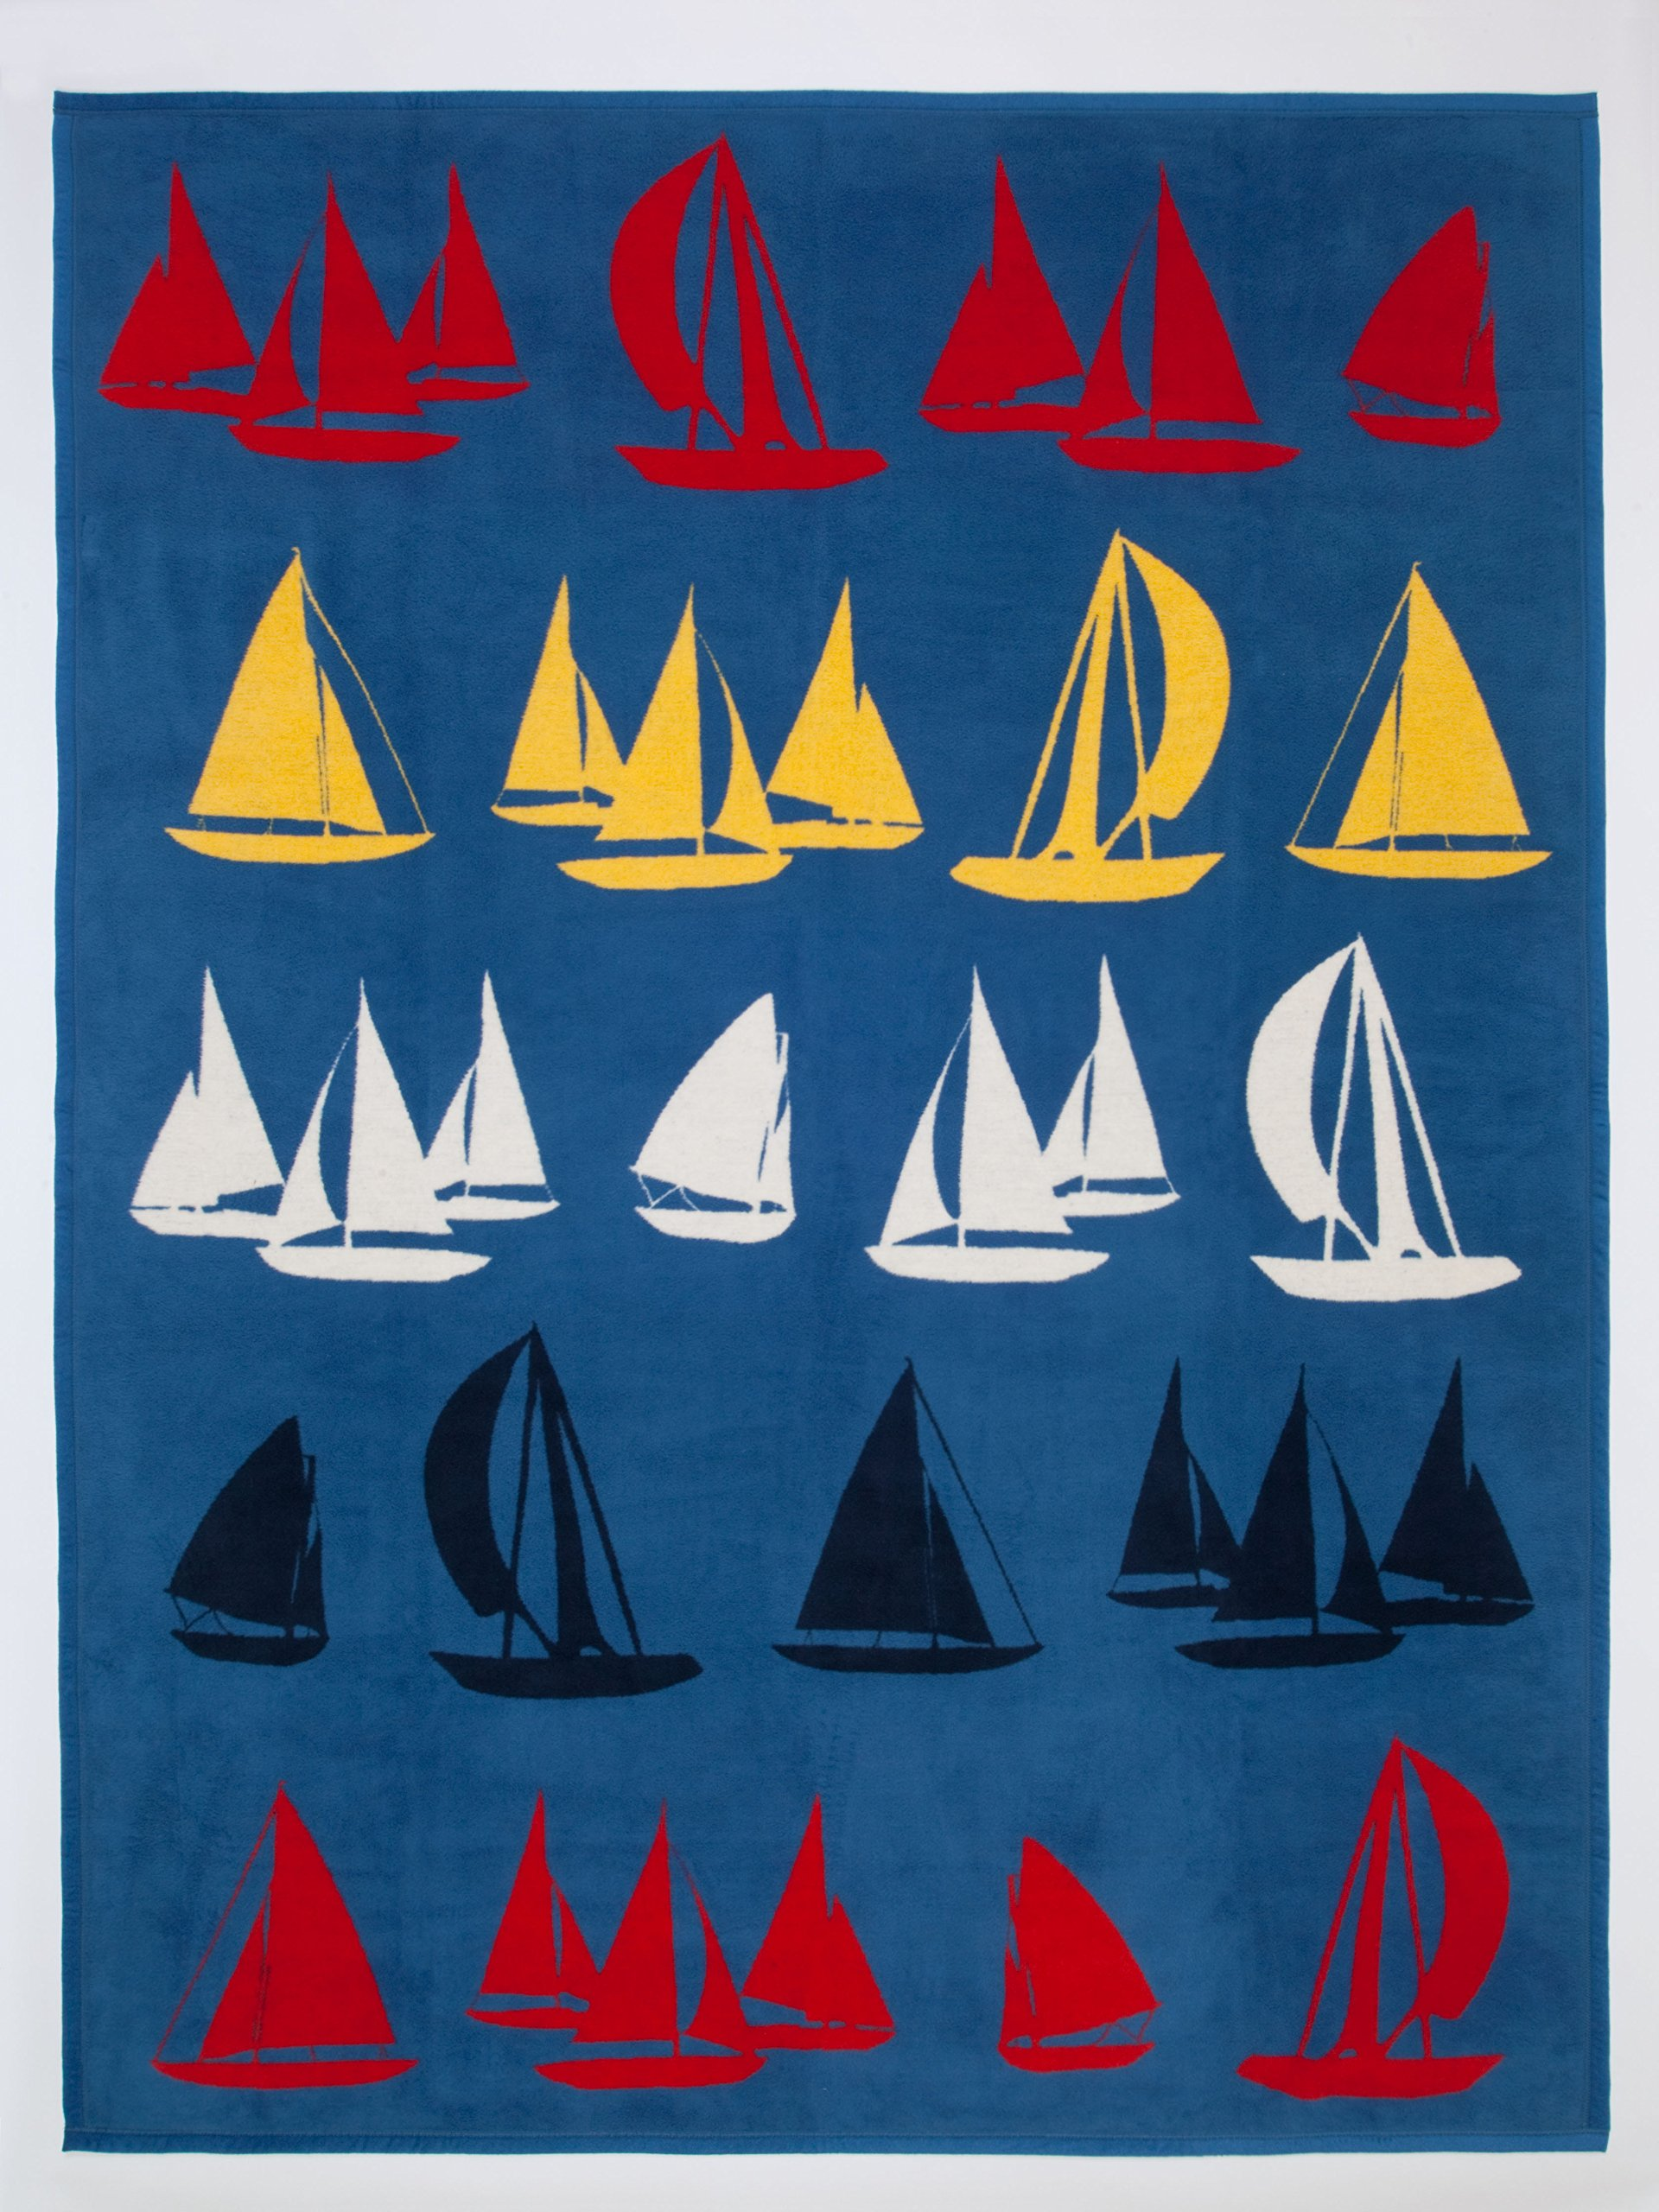 ChappyWrap Oversize Cotton Throw Blanket - Coastal Living Collection by ChappyWrap (Image #6)